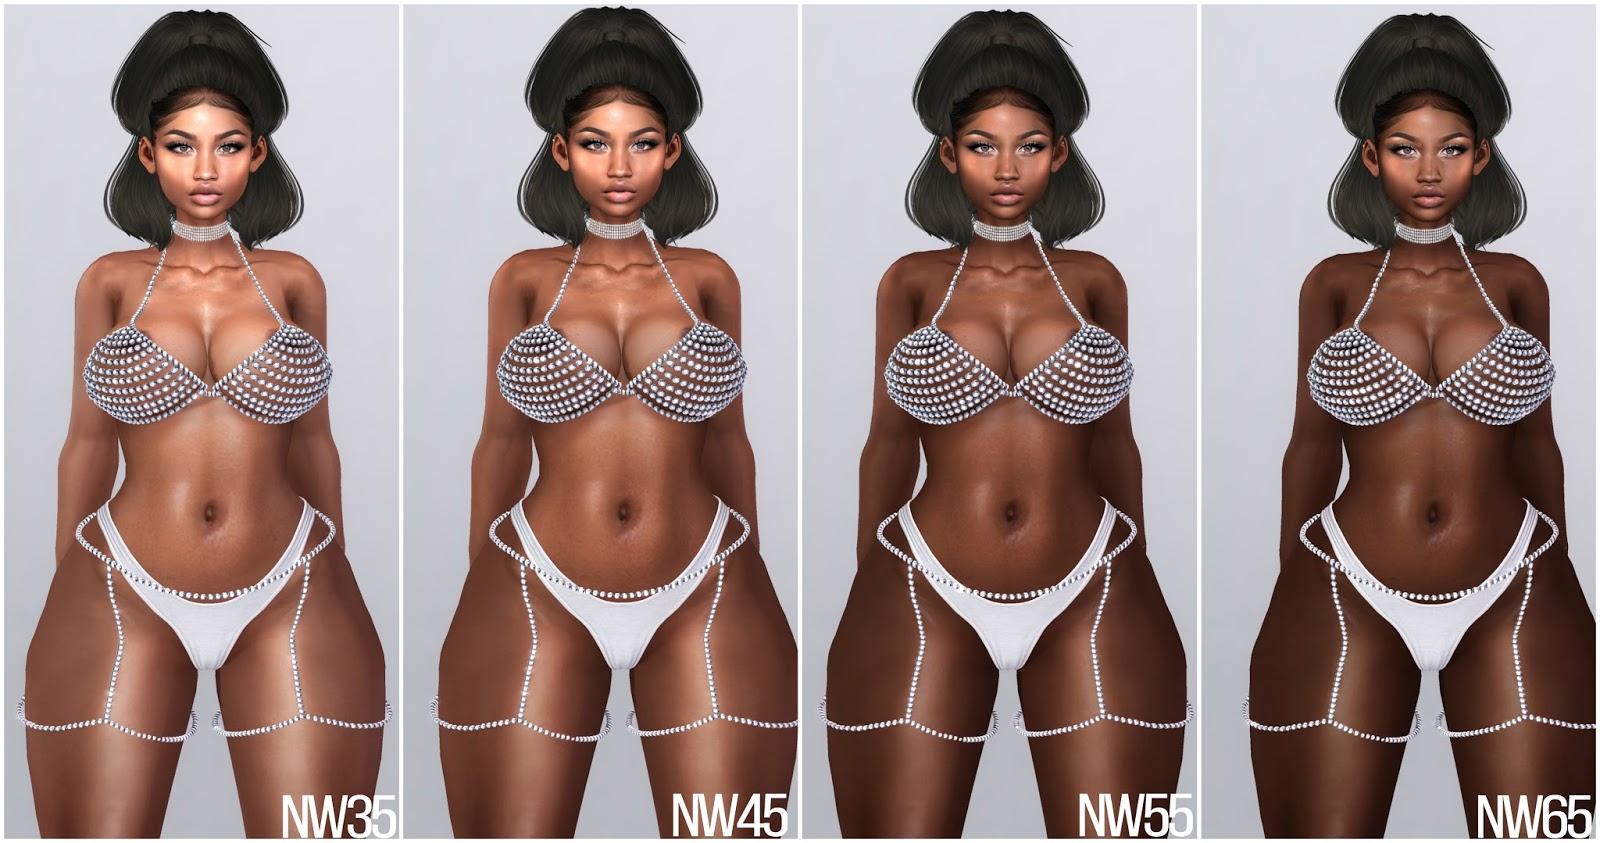 Bikini Remy Ma nudes (72 photos), Tits, Hot, Feet, cameltoe 2017